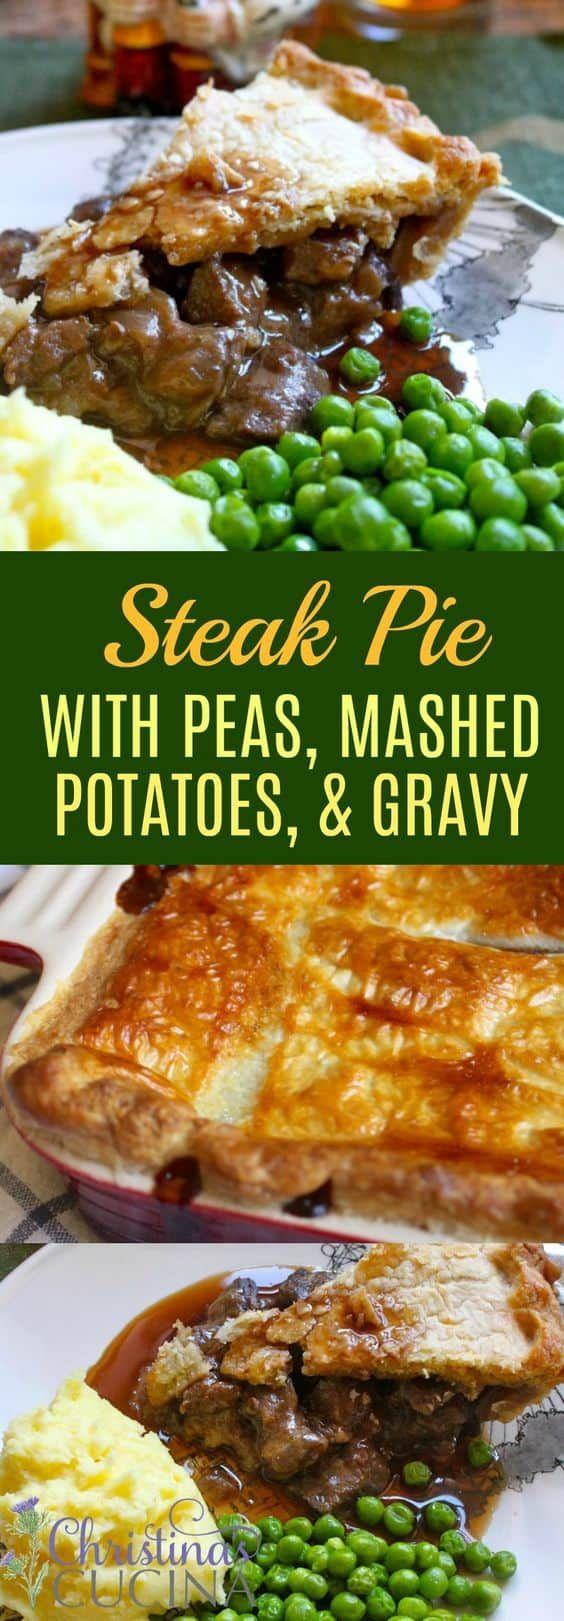 Steak Pie with Peas, Mashed Potatoes, & Gravy #scottish # ...